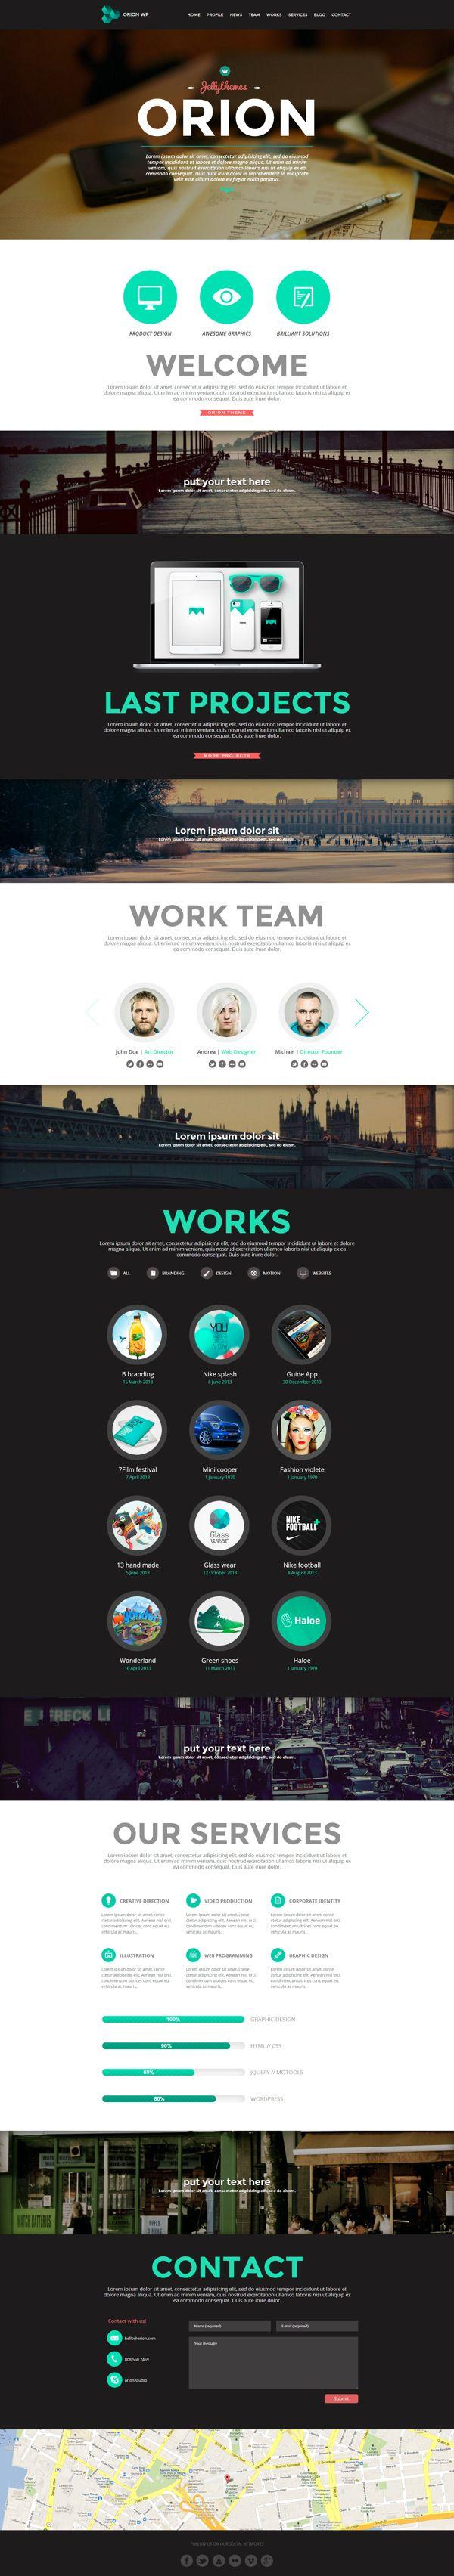 Orion - Responsive One Page WordPress Template by Zizaza - design ocean , via Behance.